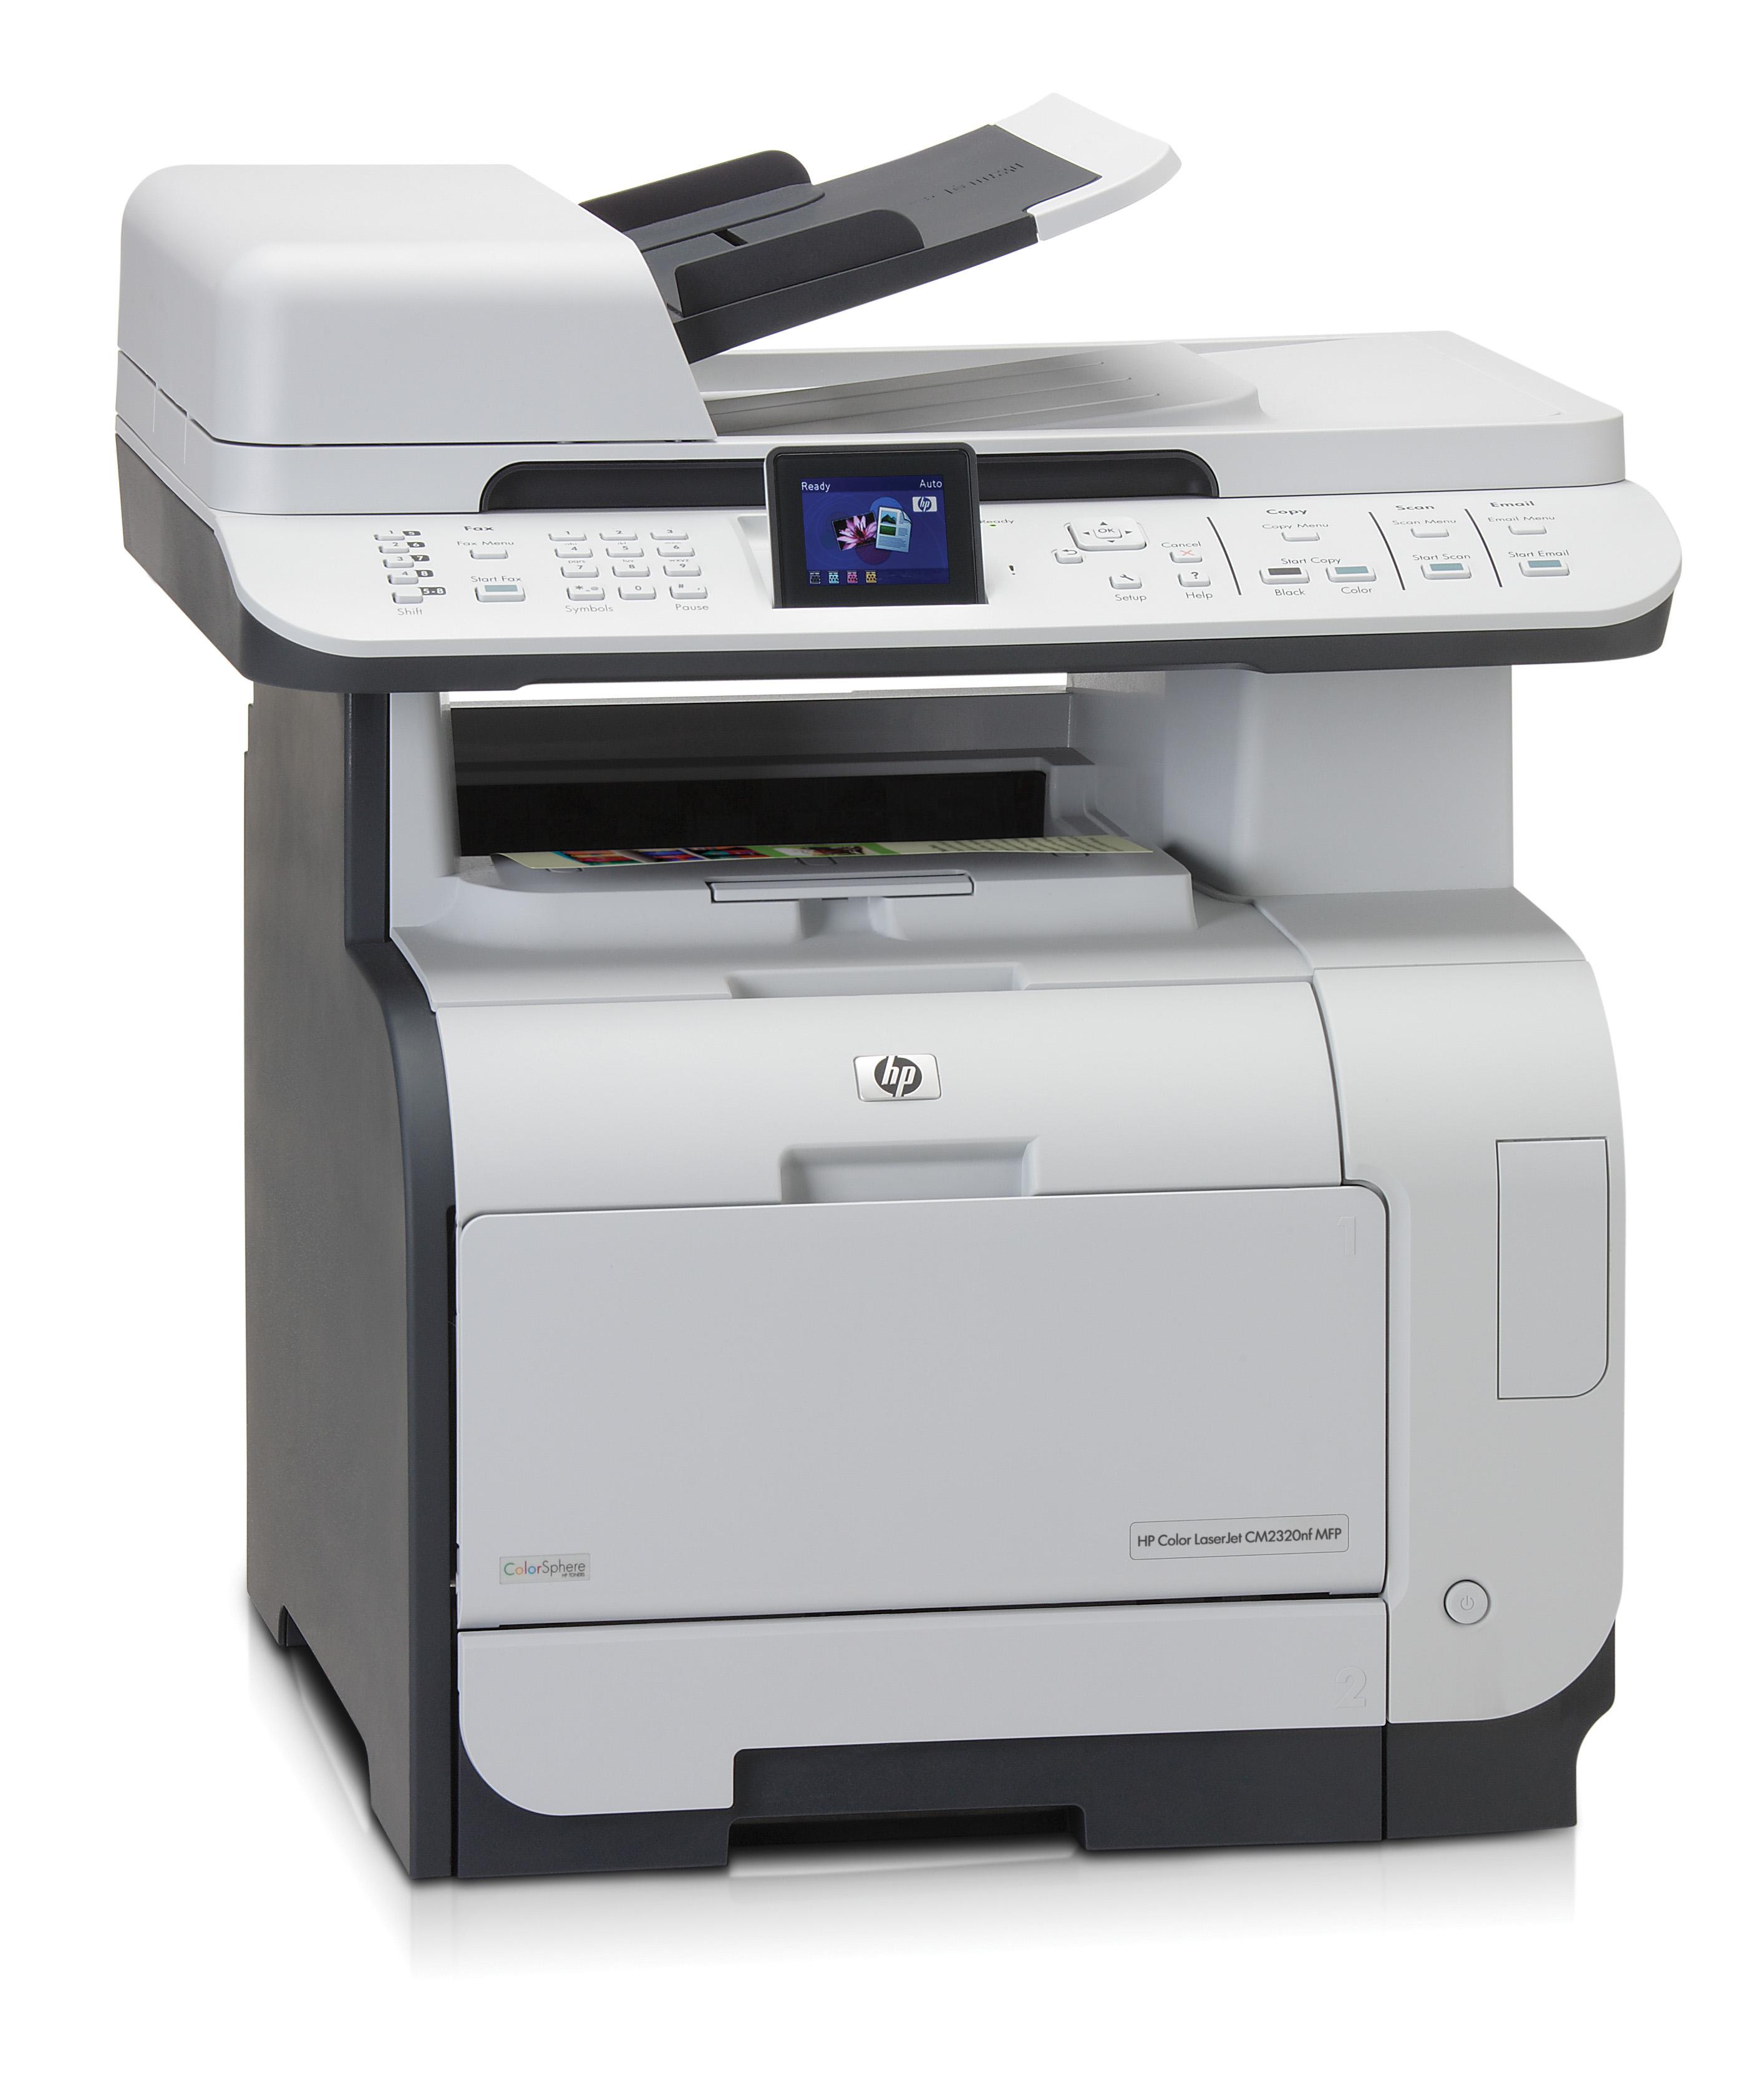 Принтер HP Color LaserJet CM2320nf Multifunction Printer